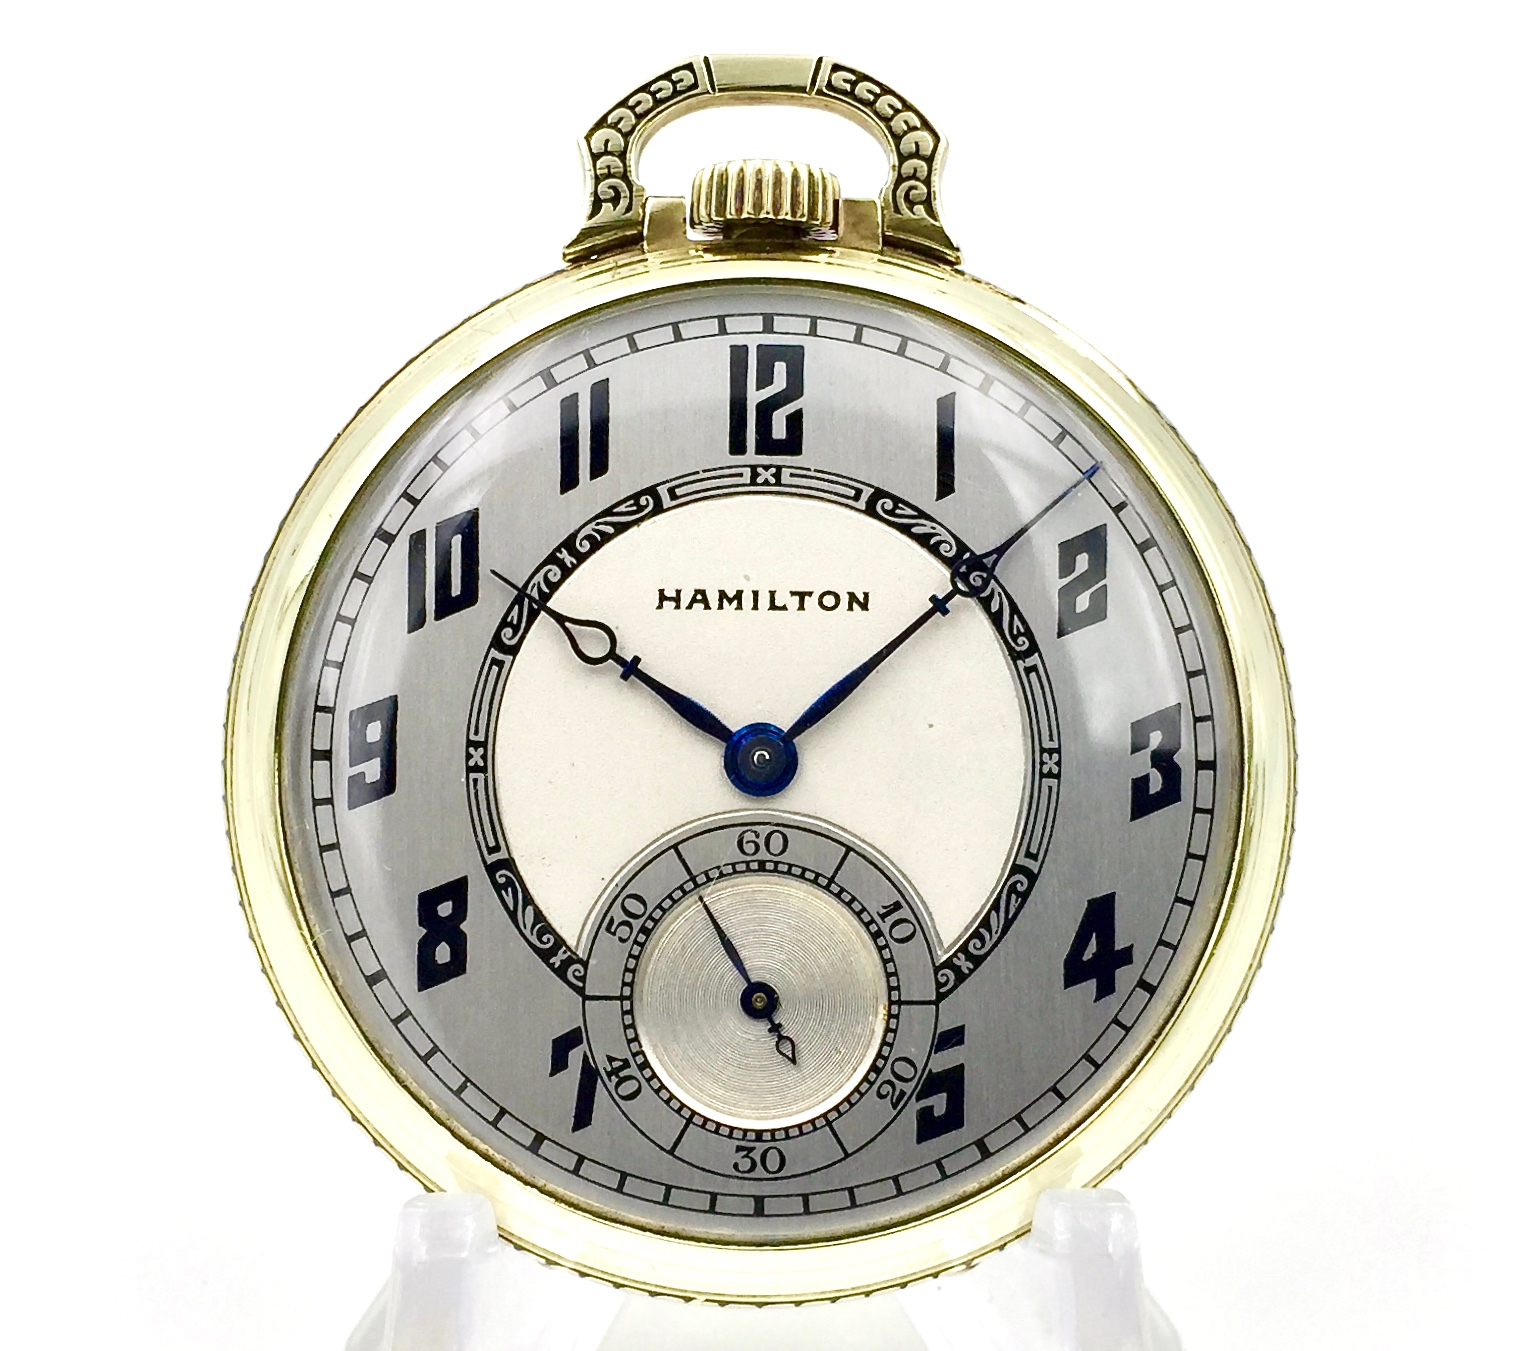 1923 hamilton dress watch in original box grade 912 size 12 17 home pocket watches era roaring twenties 1920s 1923 hamilton dress watch in original box grade 912 size 12 17 jewels aloadofball Choice Image